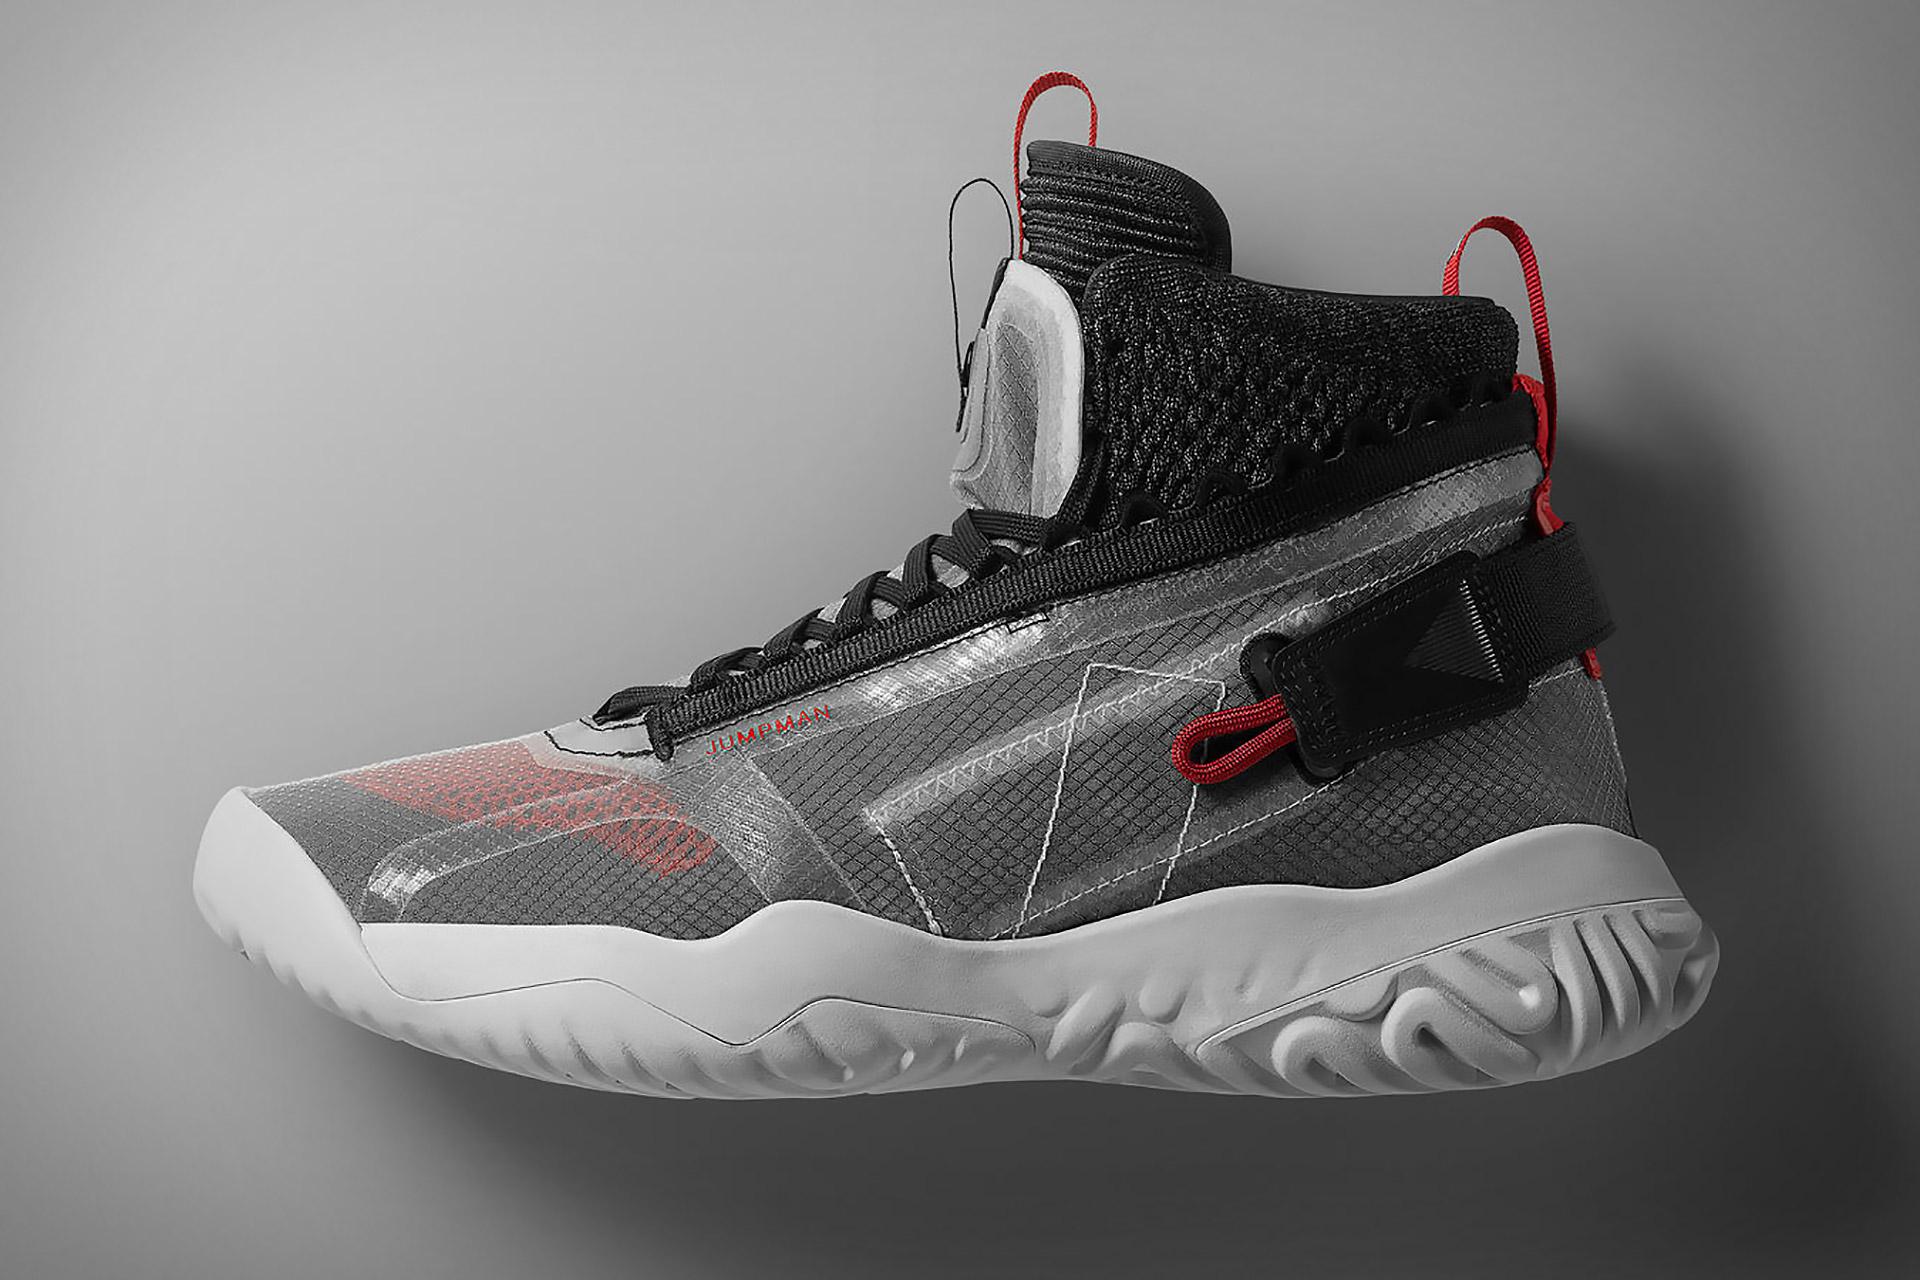 020eac40bd31 Jordan Apex-Utility Sneaker